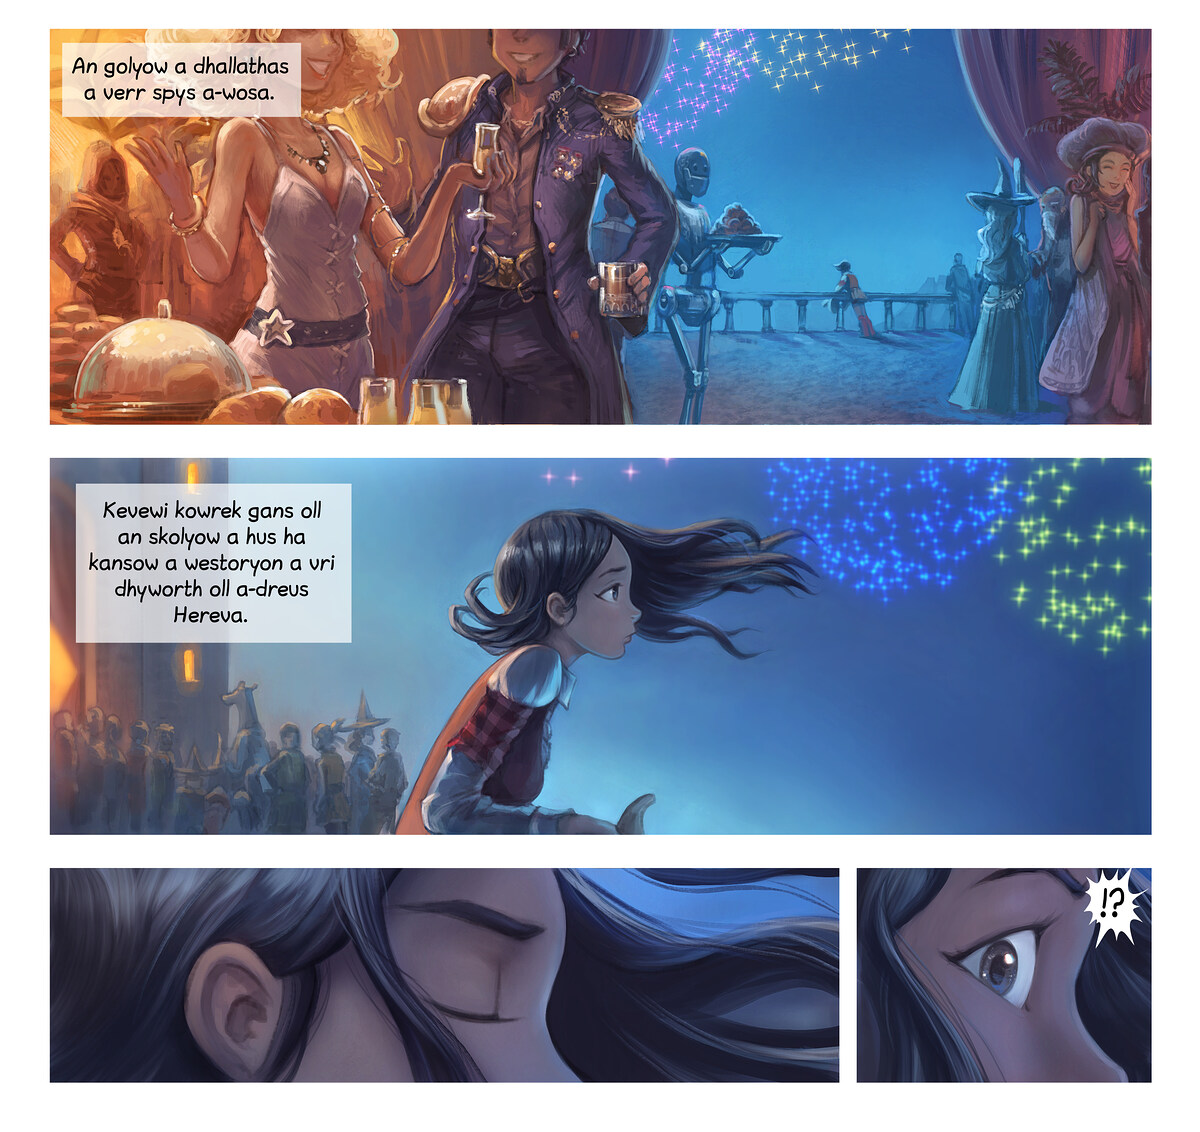 Rann 28: An Golyow, Page 3